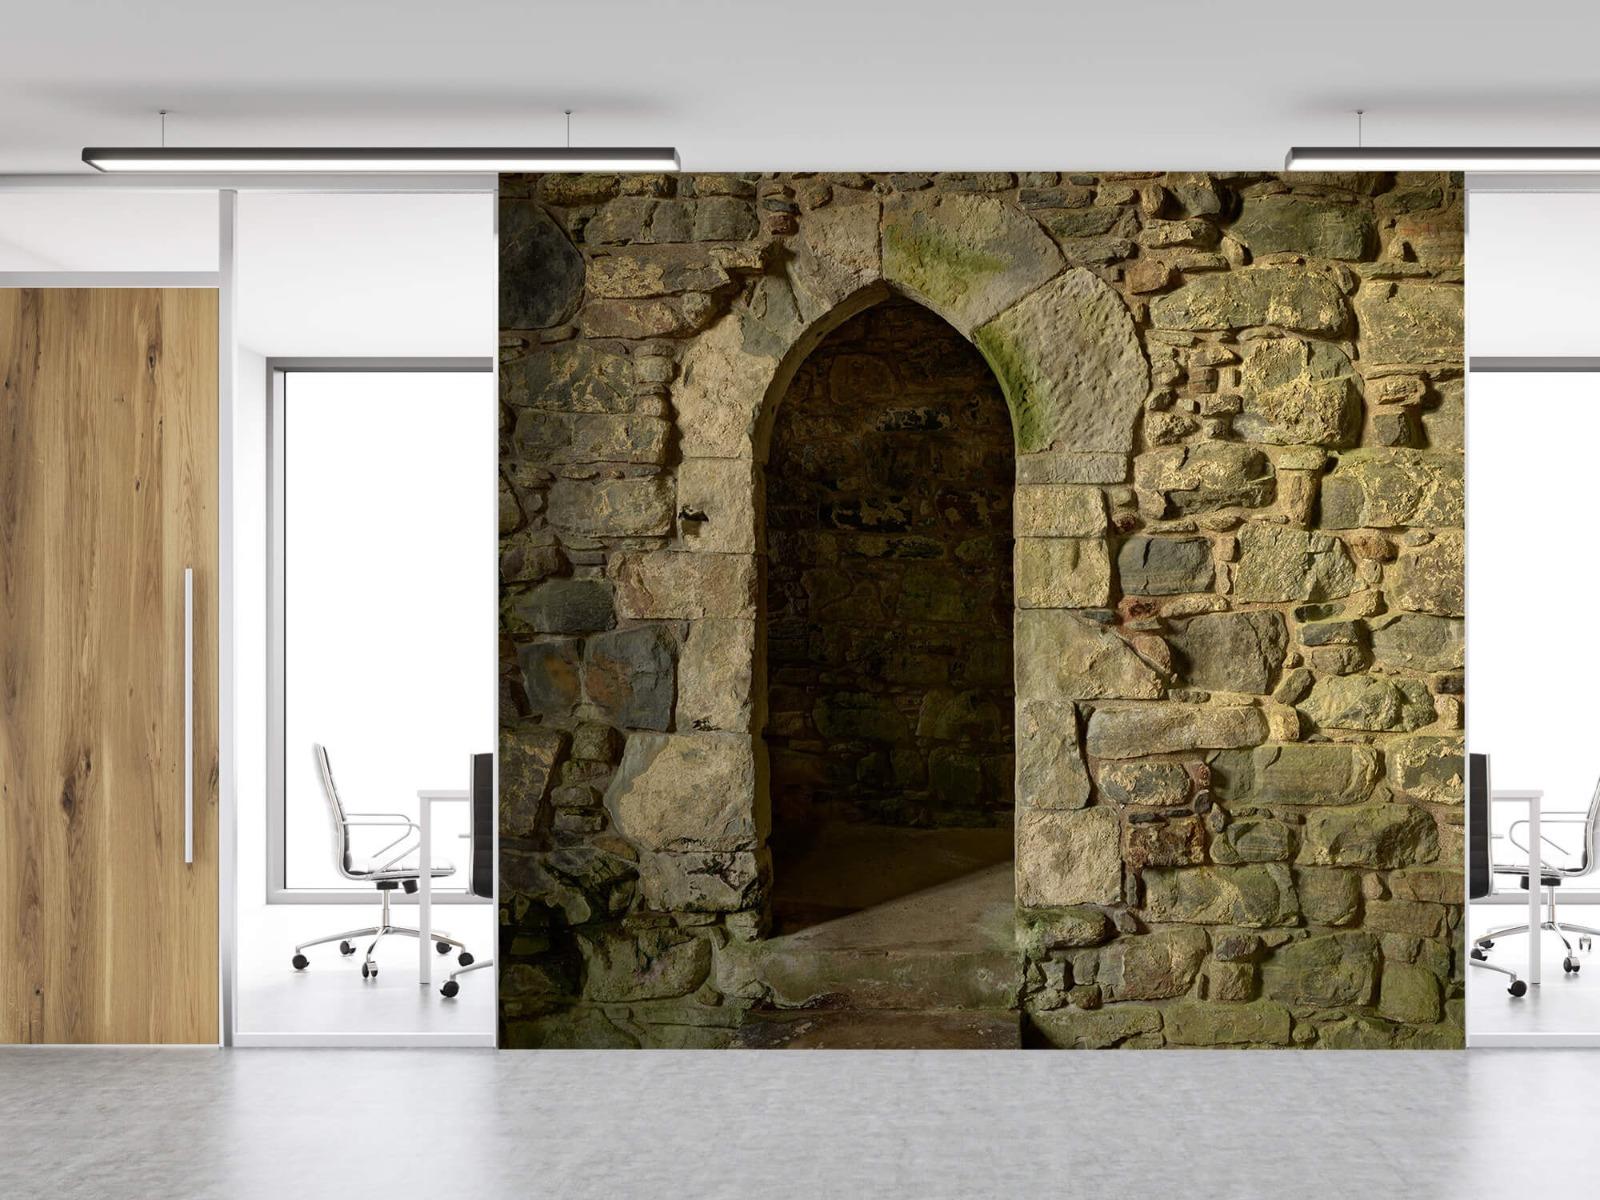 Steen behang - Oude muur met doorgang - Slaapkamer 12